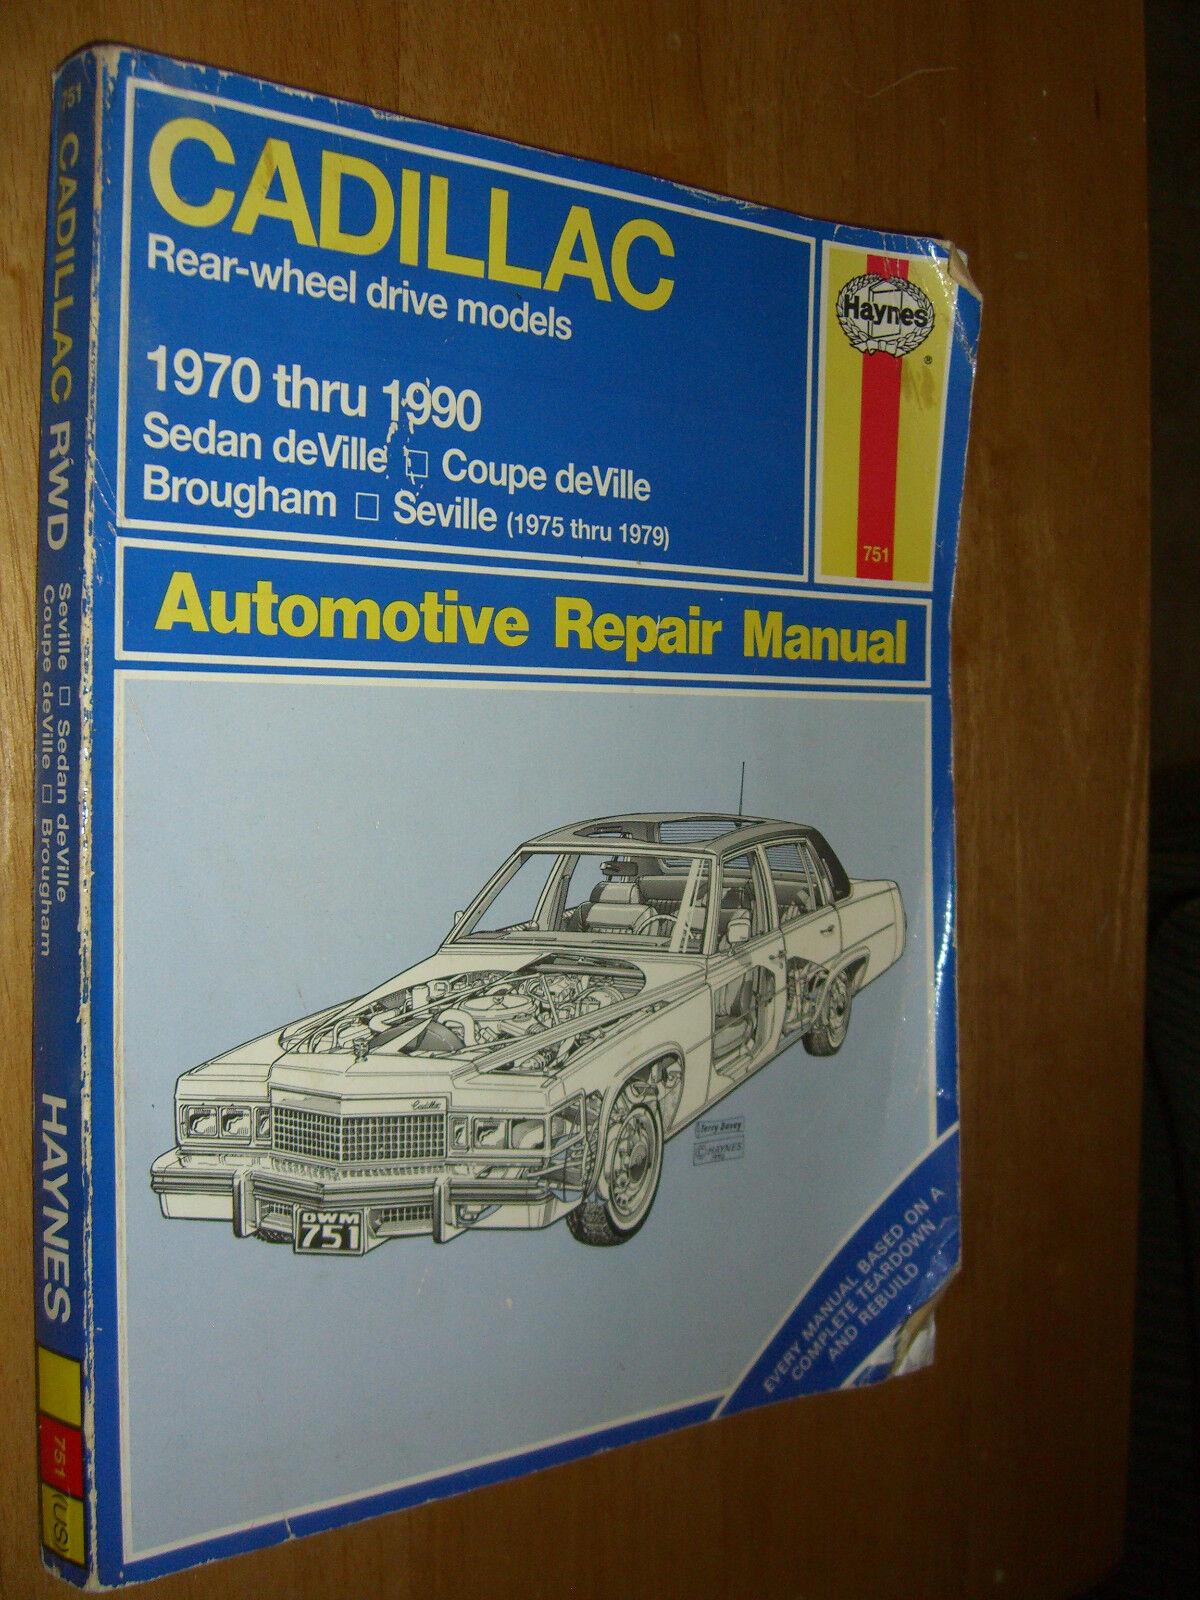 Haynes Cadillac Rear Wheel Drive Automotive Repair Manual, No. 751 : 1970-1990  by J. H. Haynes and Jon LaCourse (1991, Paperback)   eBay